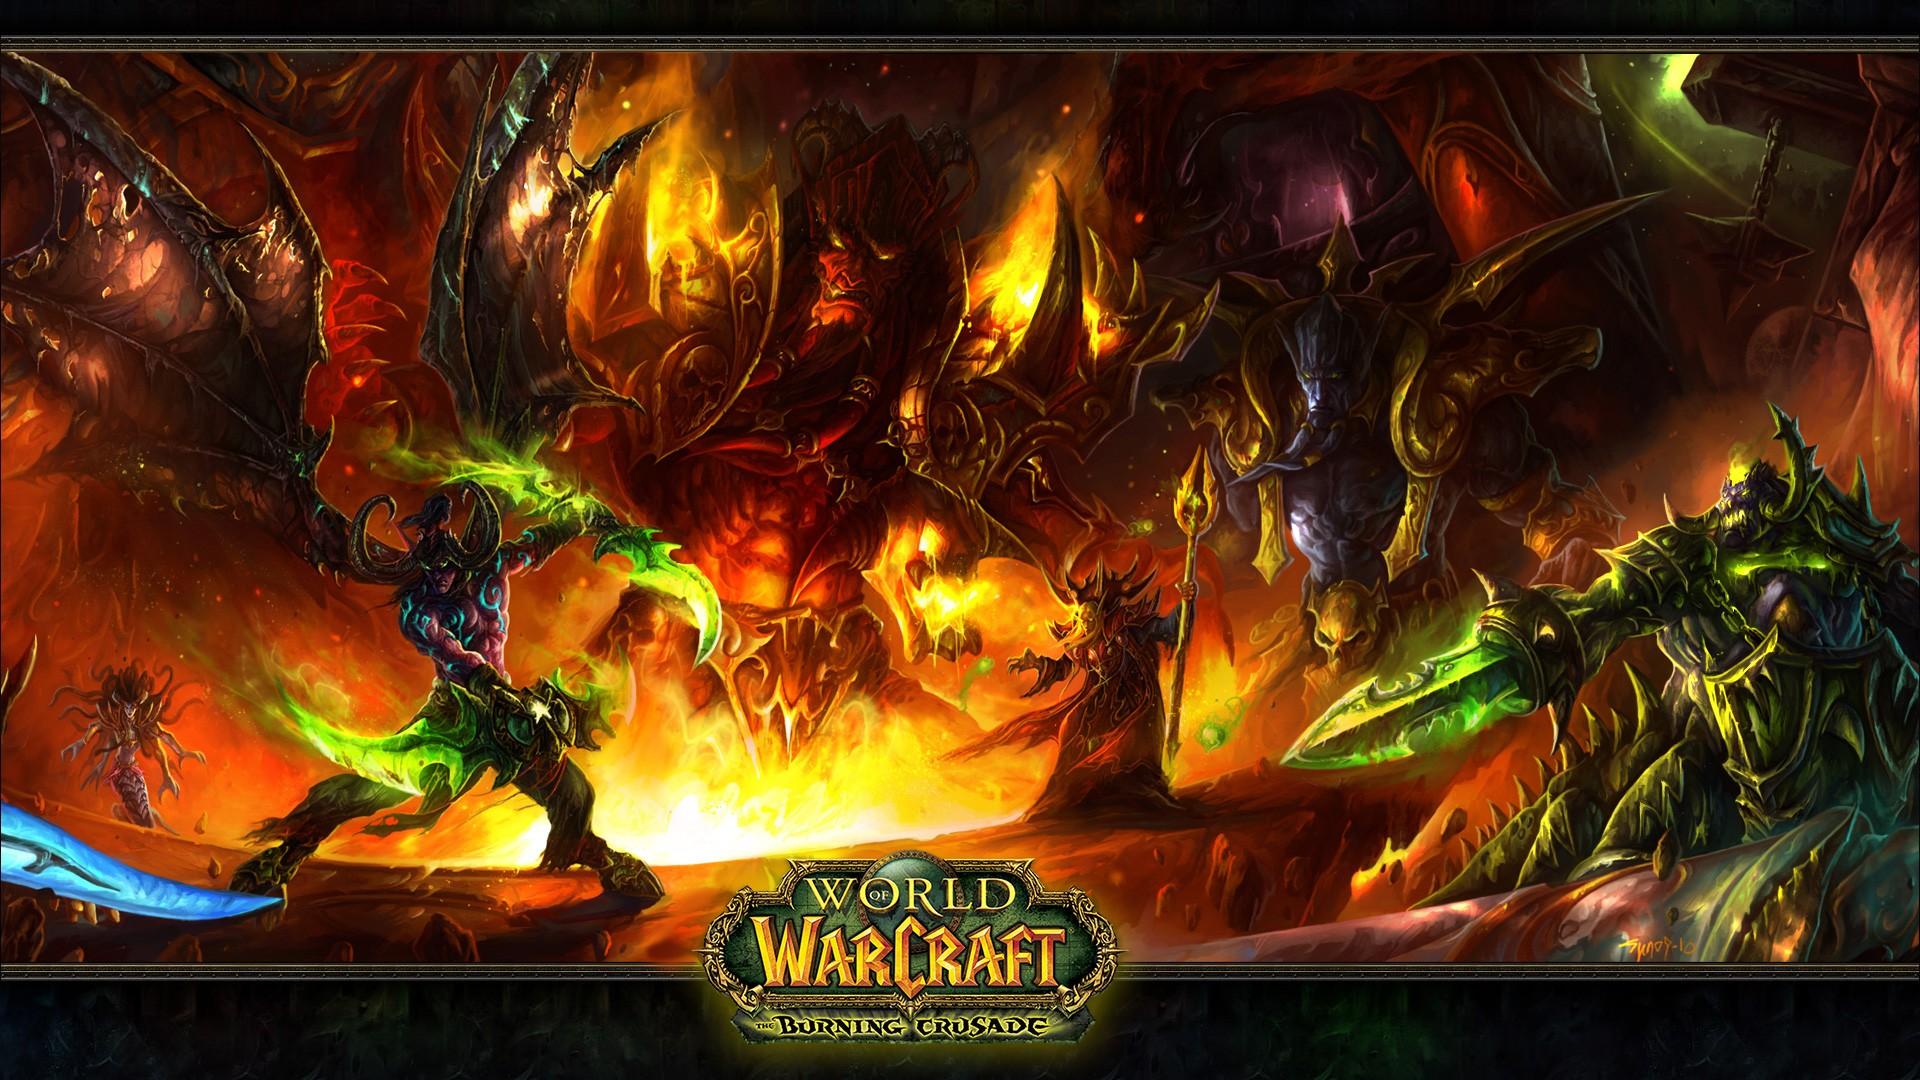 World Of Warcraft Draenei Hd Photo Wallpaper Pocketyguyscom